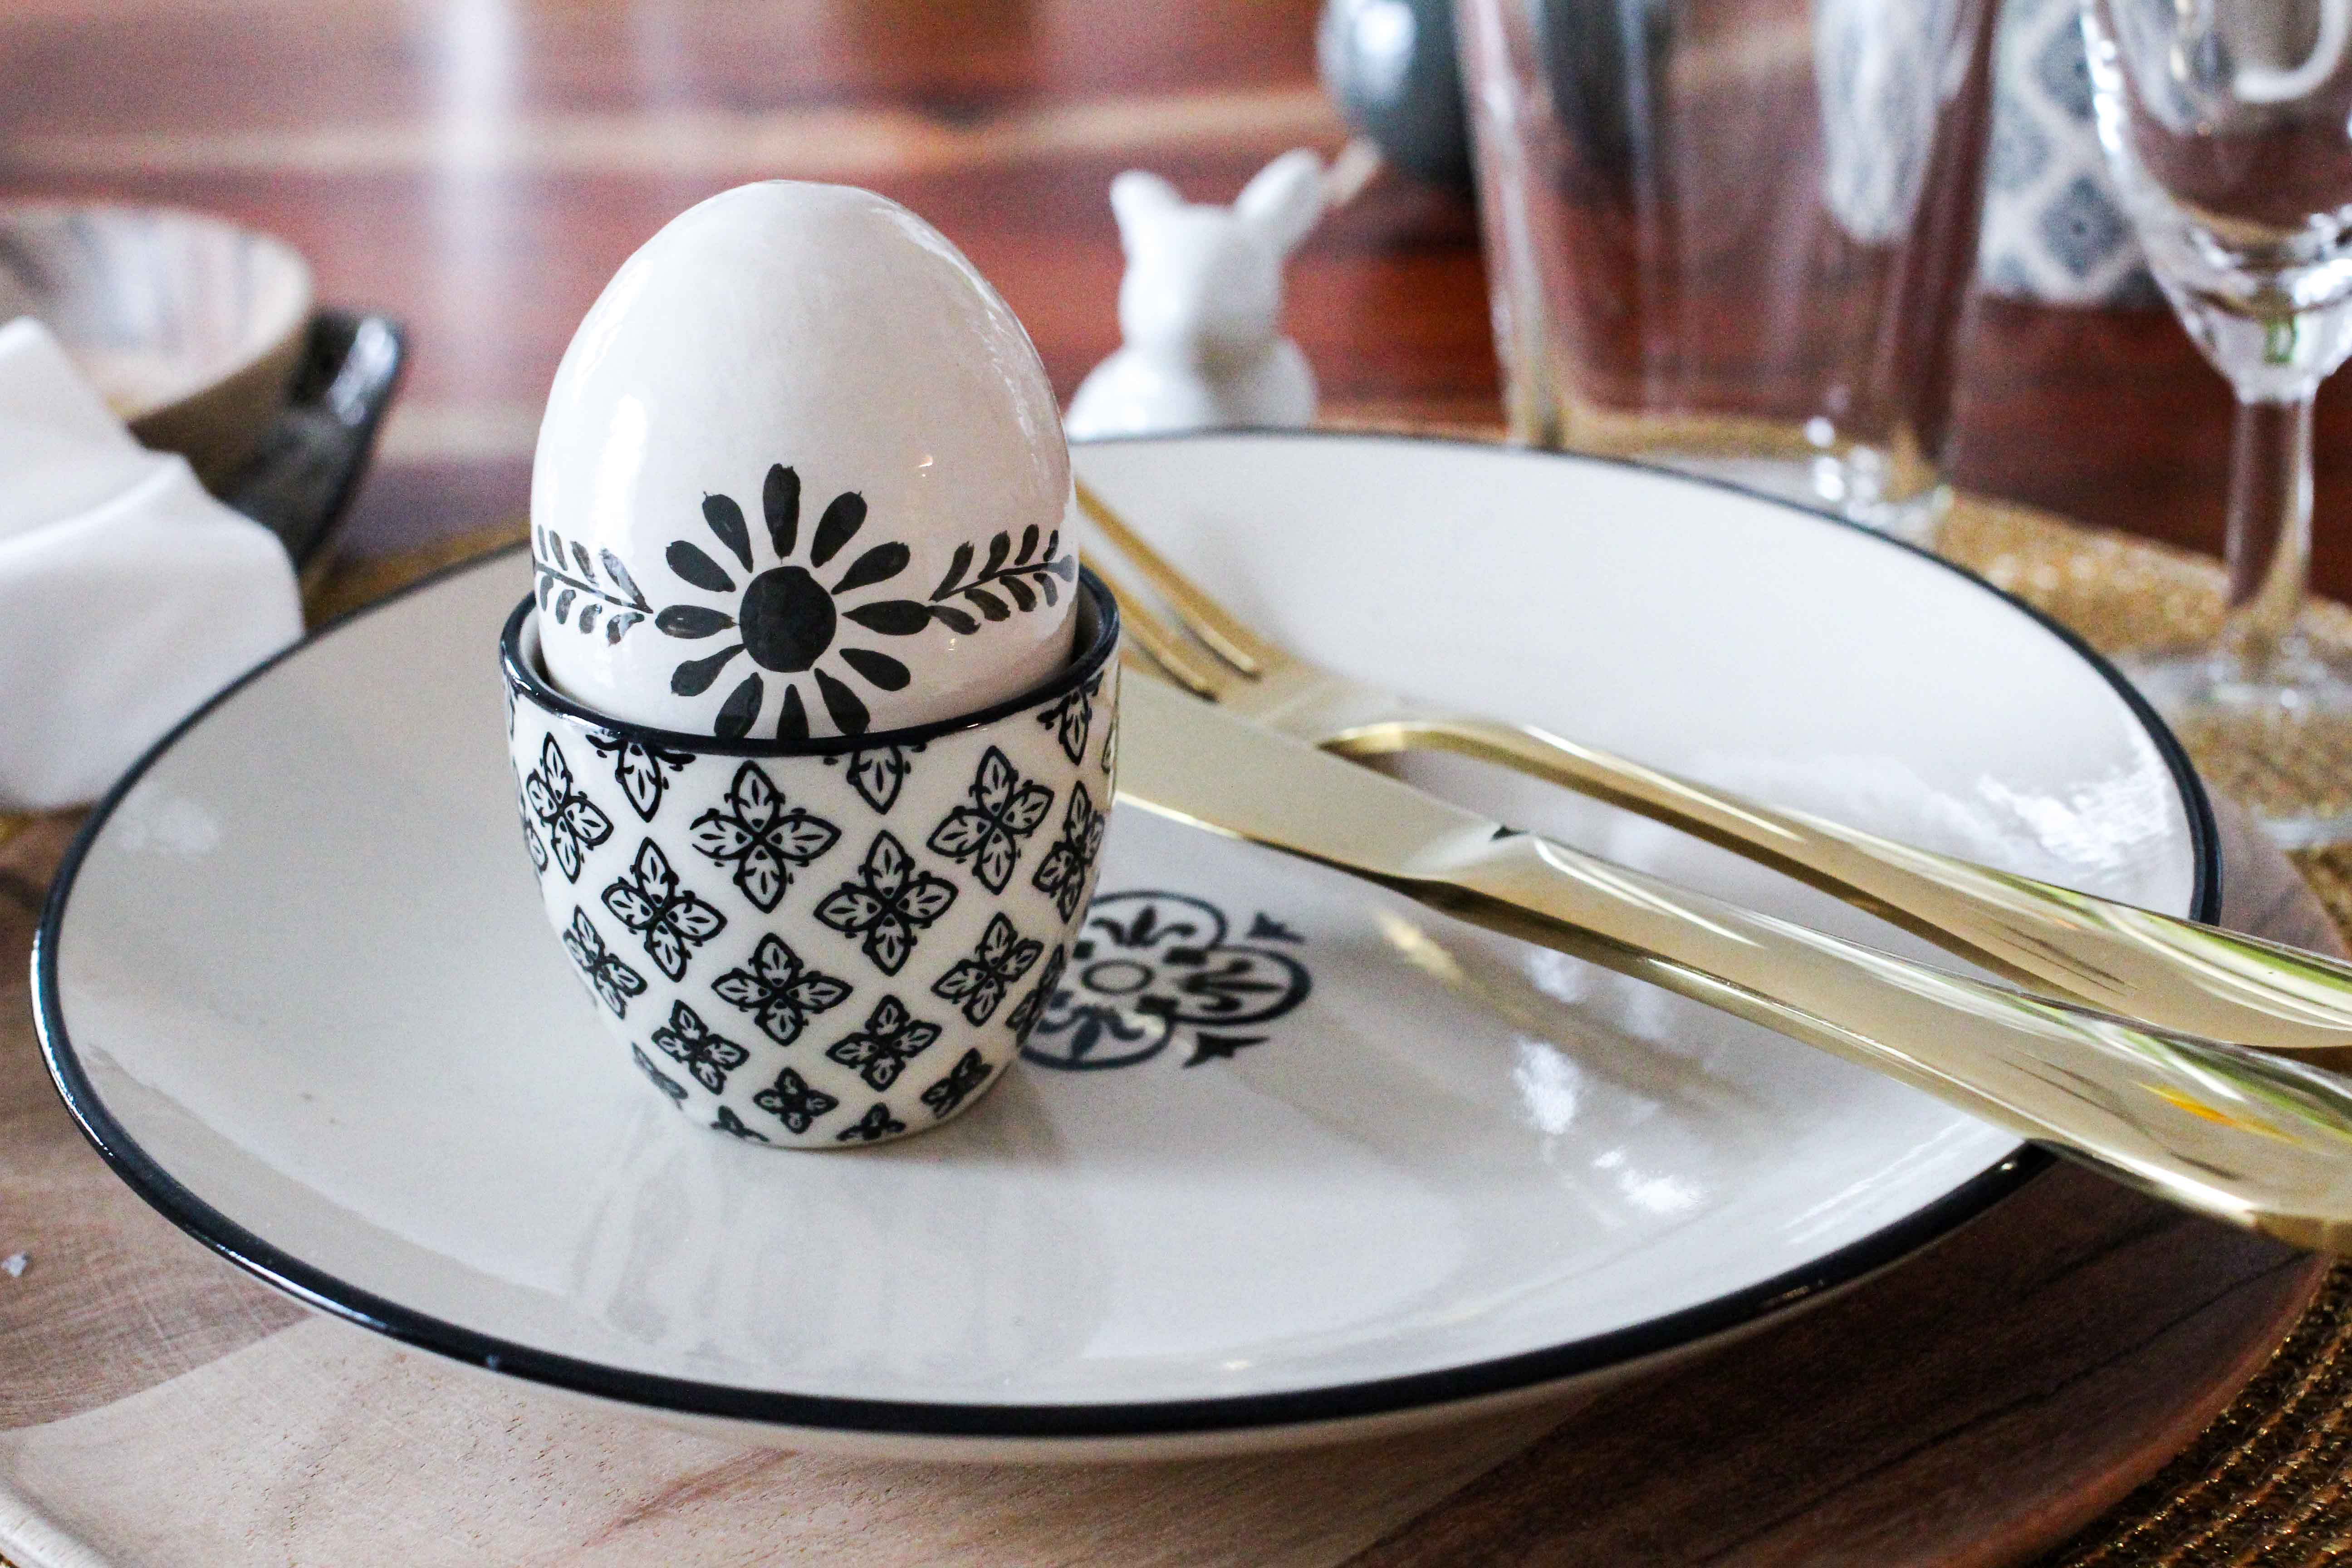 Eierbecher Oster Tisch Dekoration skandinavisches Design Ib Laursen Ostern Tisch dekorieren Besteck Gold Holzteller Interior Blog Ostereier Ediths